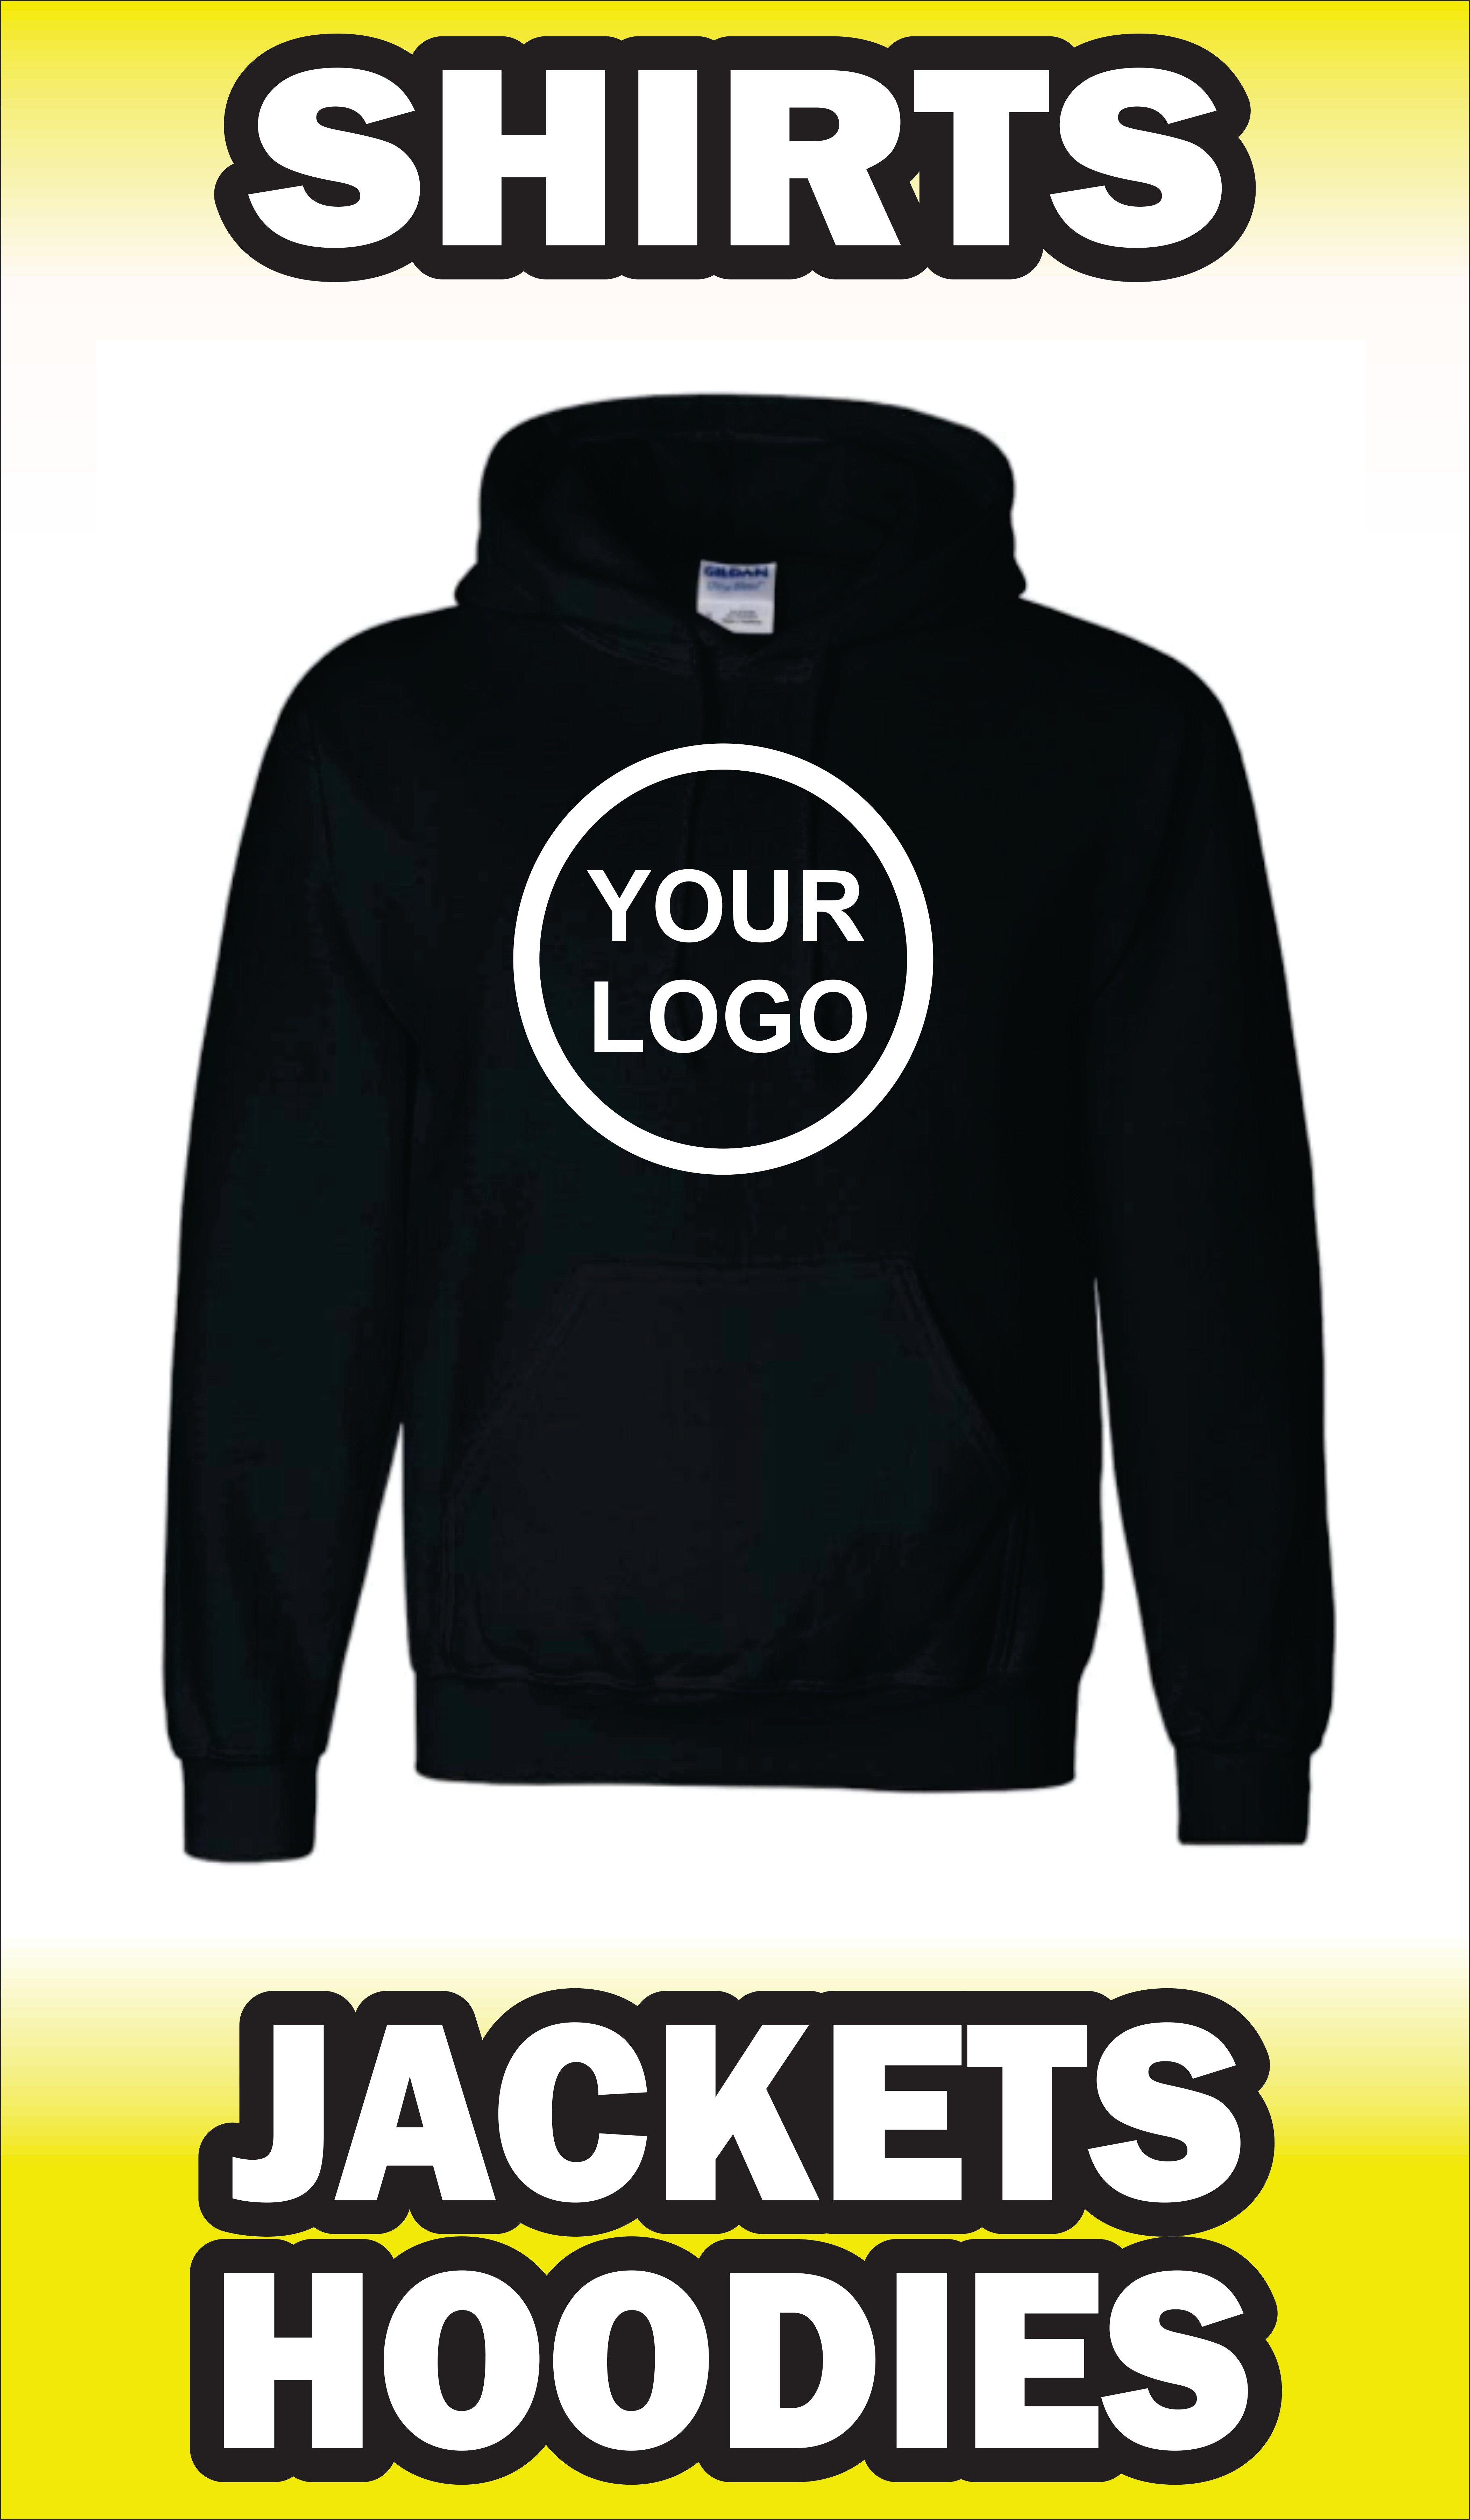 https://0901.nccdn.net/4_2/000/000/017/edb/lqp-front-digital-sign-covid-ads-oct-2020-jackets-hoodies-facebo.jpg